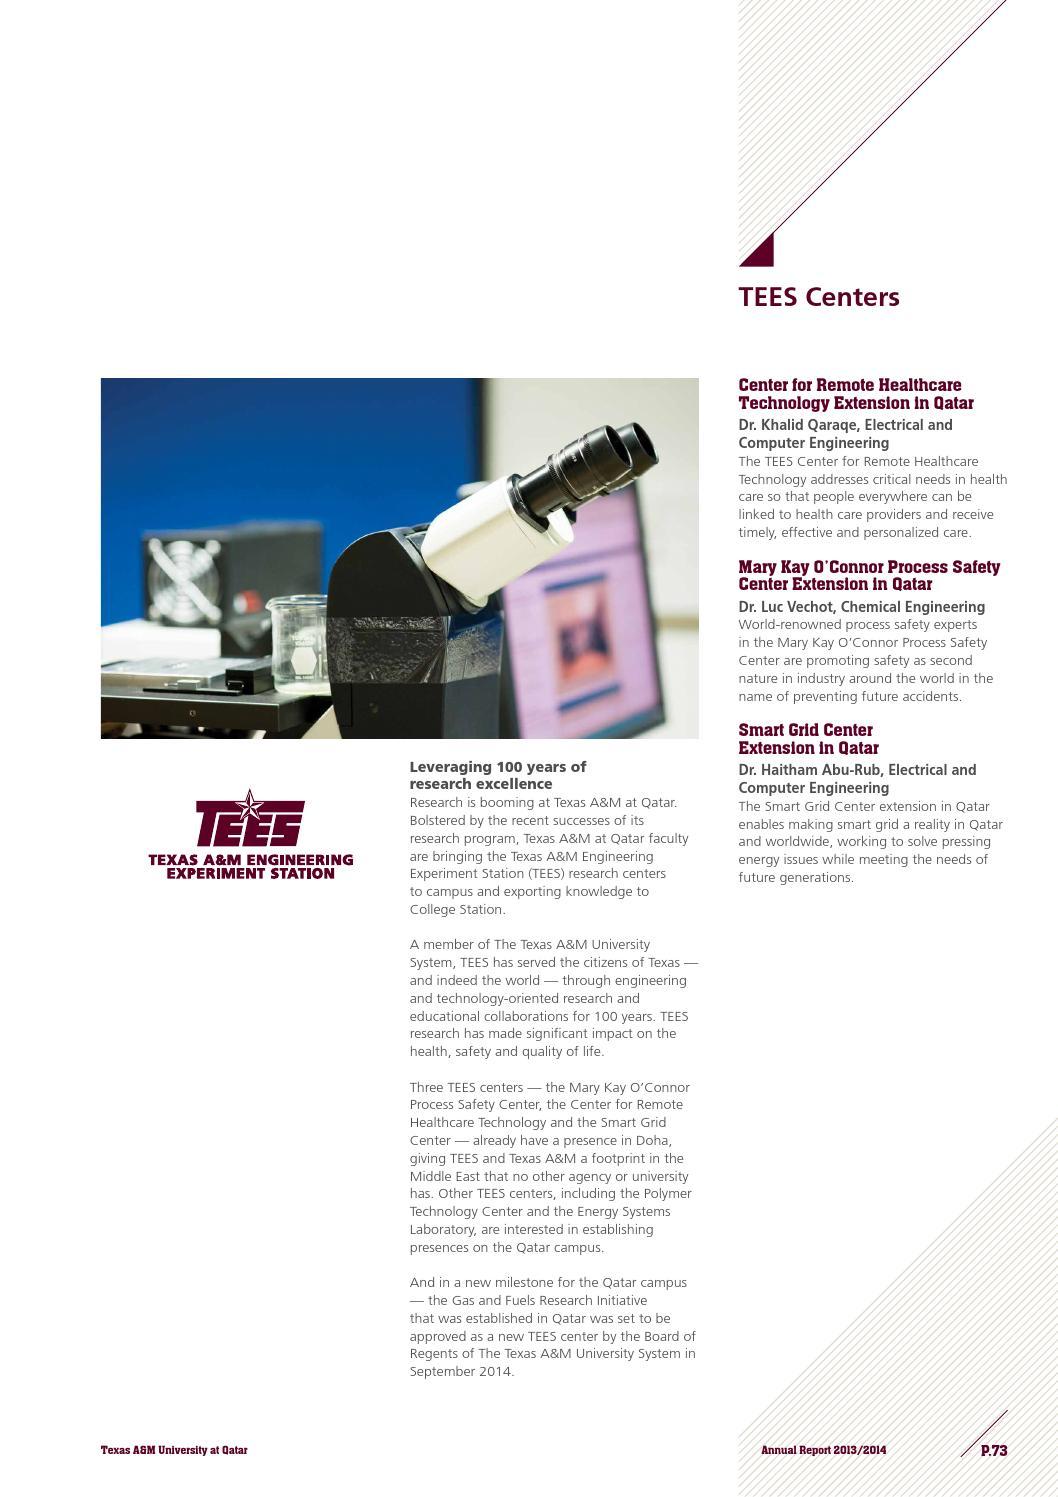 Annual report, fall 2014 by Texas A&M at Qatar - issuu